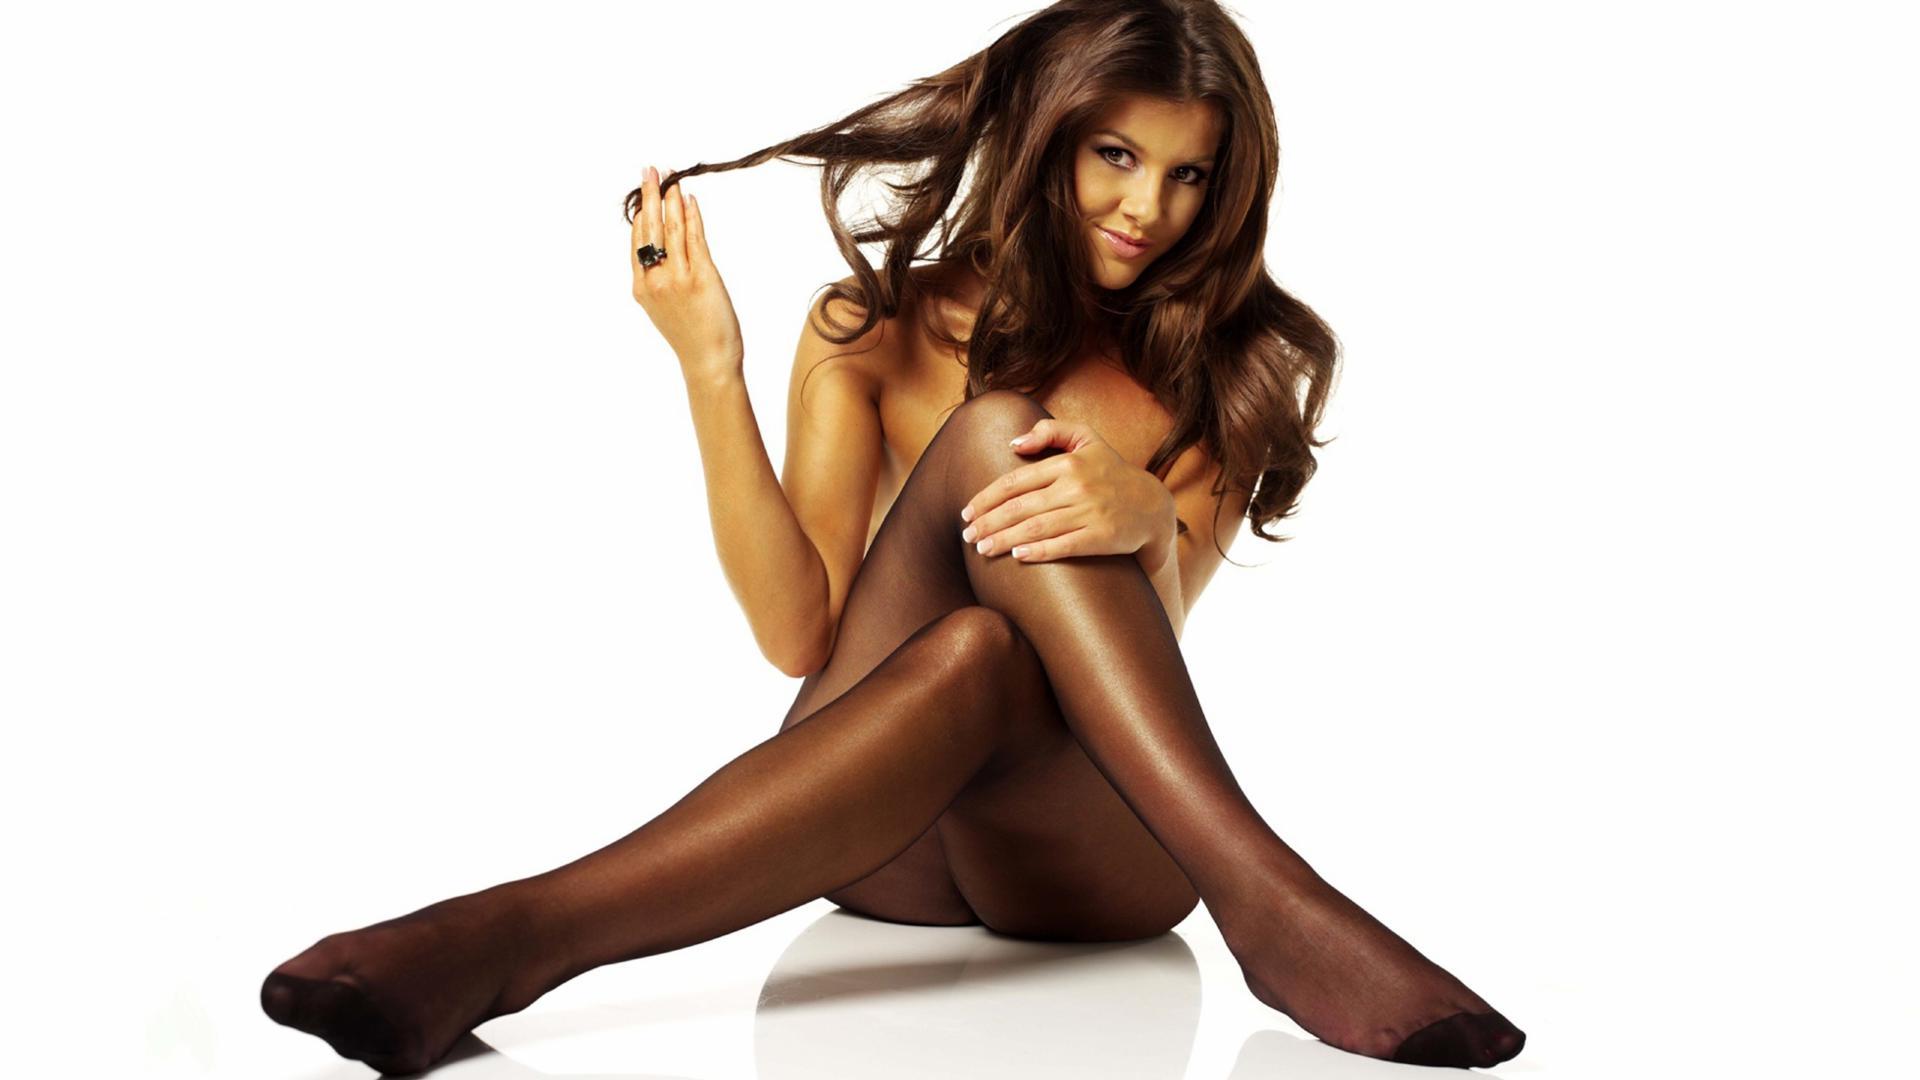 download photo 1920x1080 bru te sexy girl lingerie pantyhose